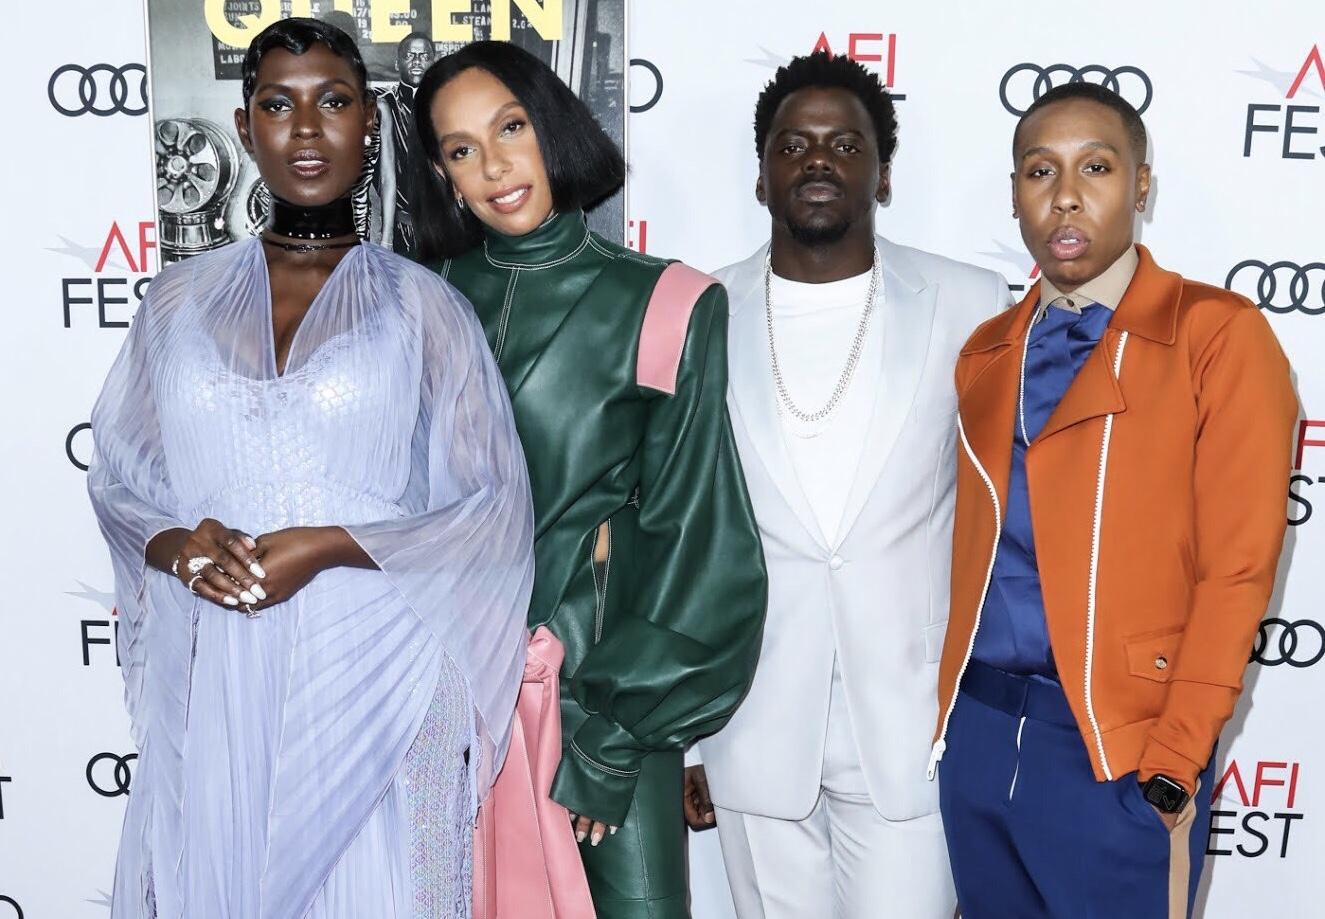 Lena Waithe, Daniel Kaluuya, and Jodie Smith Talks Queen & Slim At AFI Fest